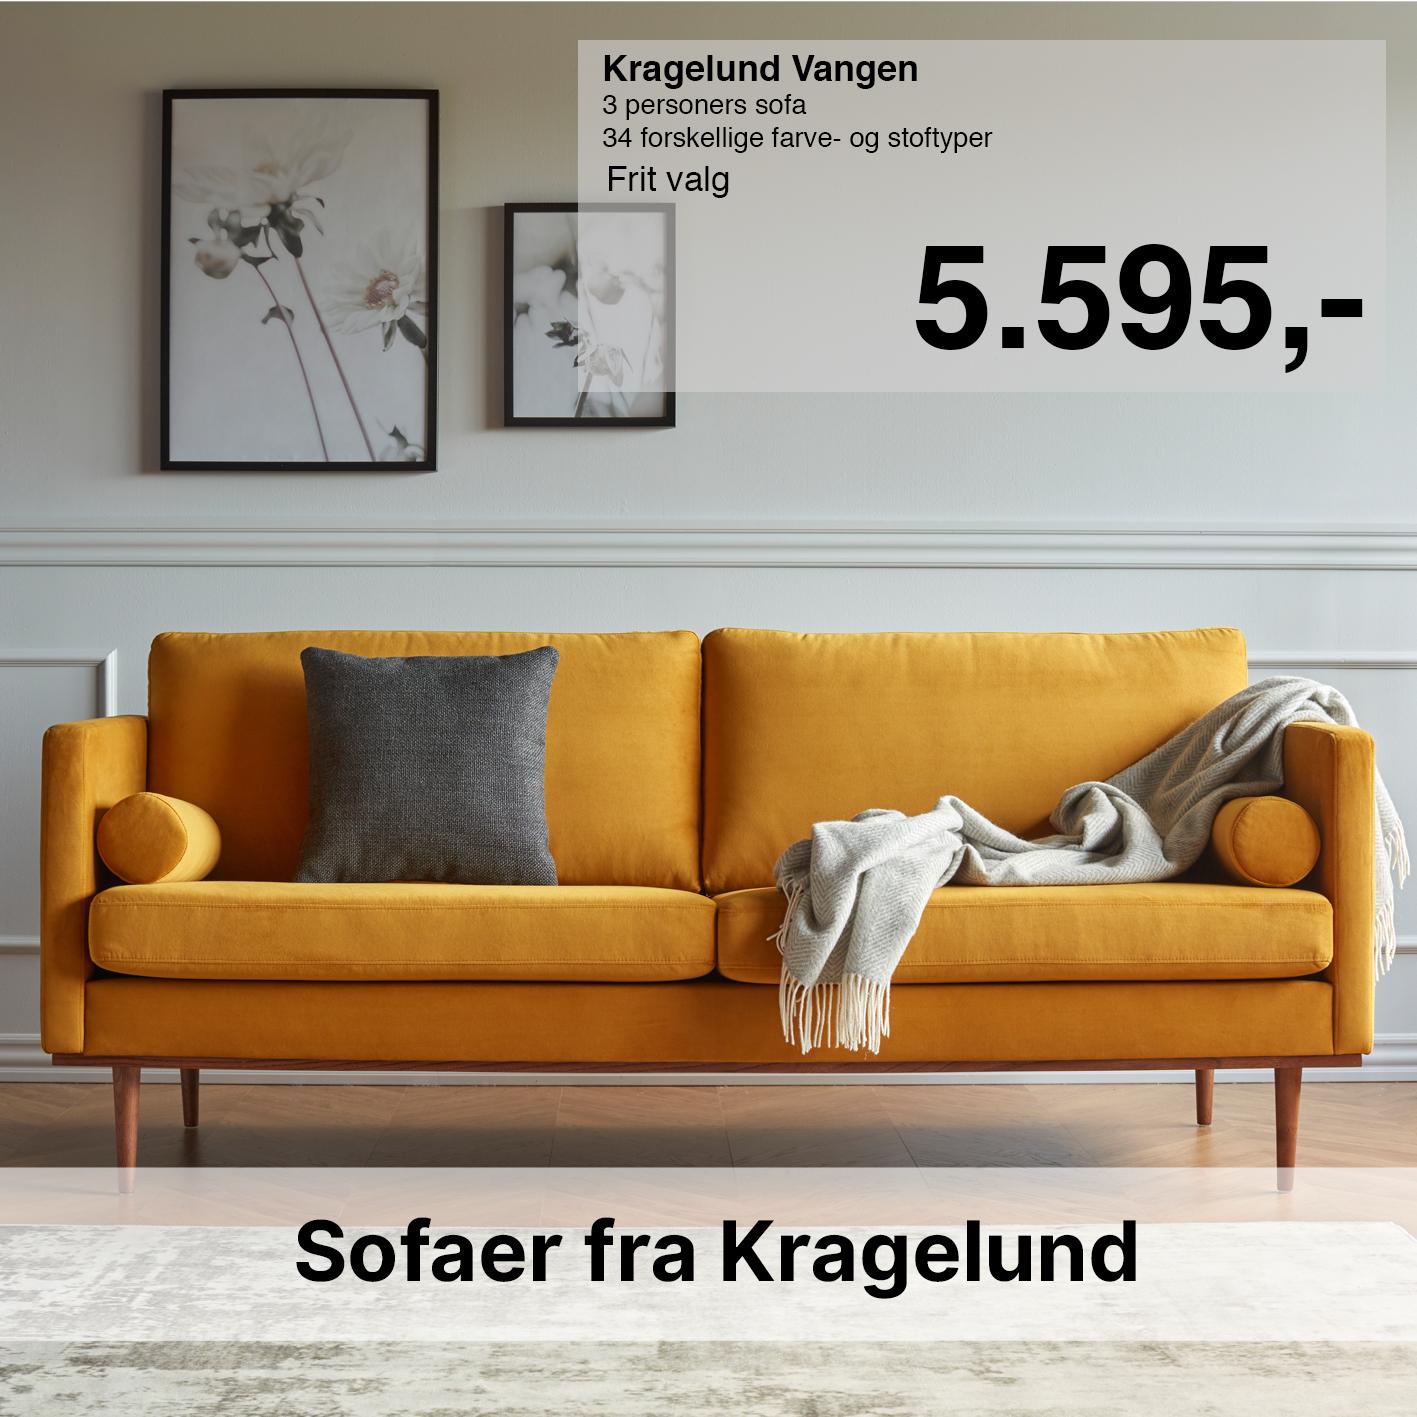 Sofaer fra kragelund